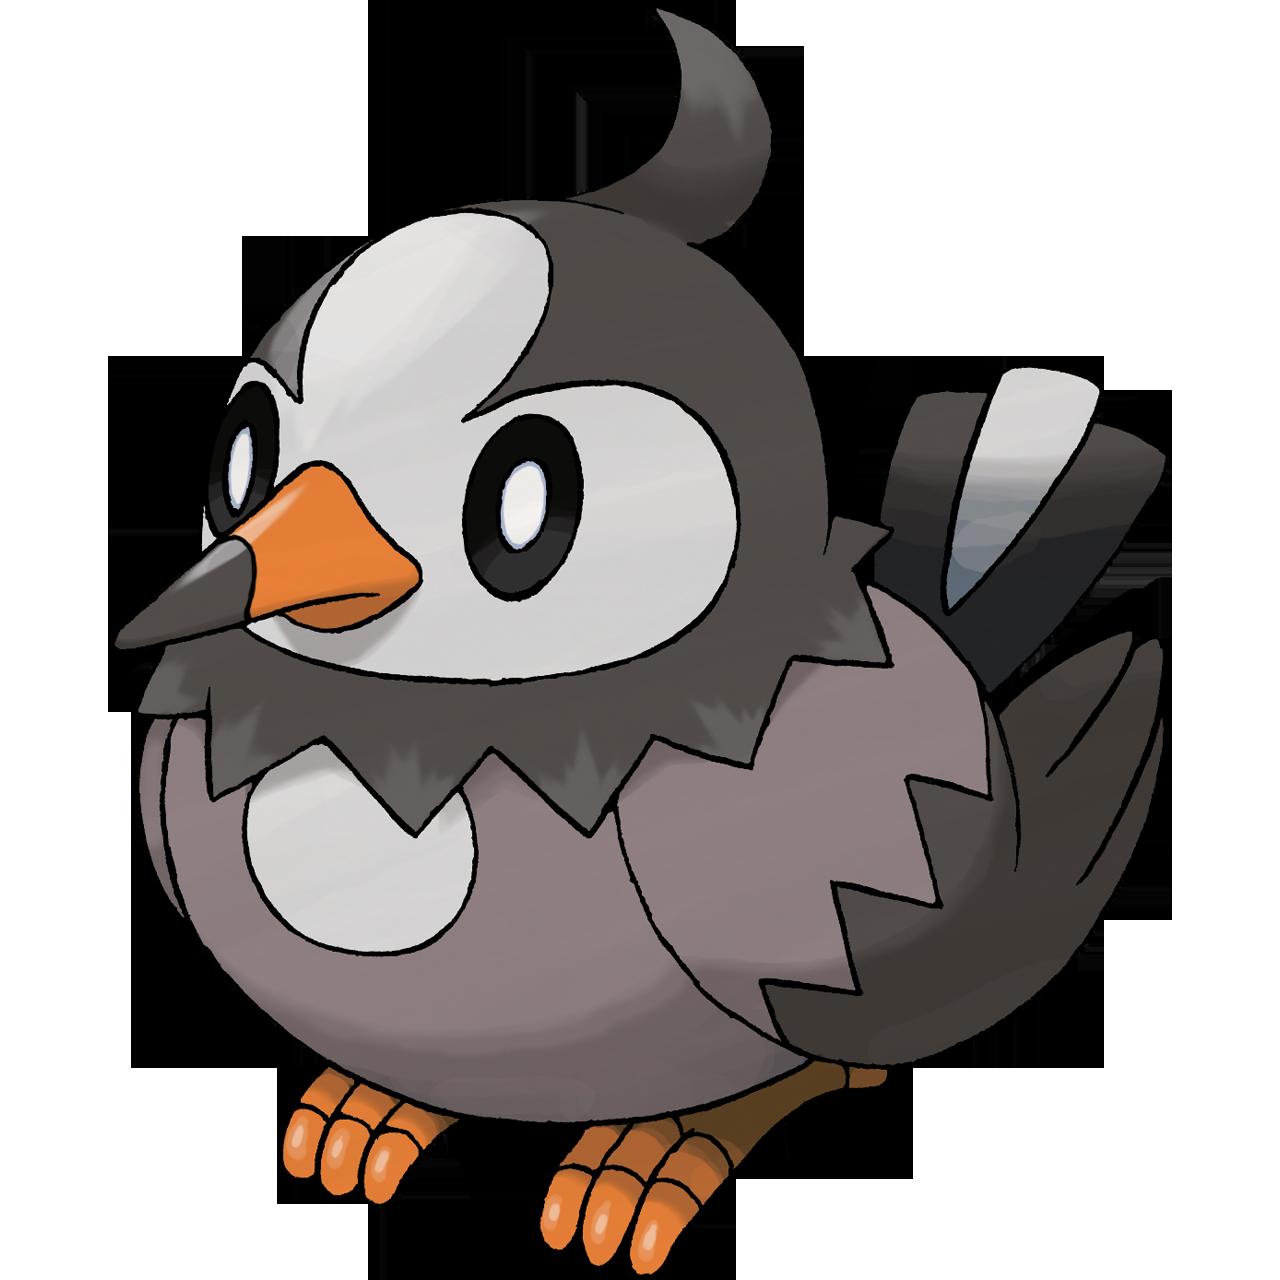 Starly | Pokemon GO Wiki - GamePress